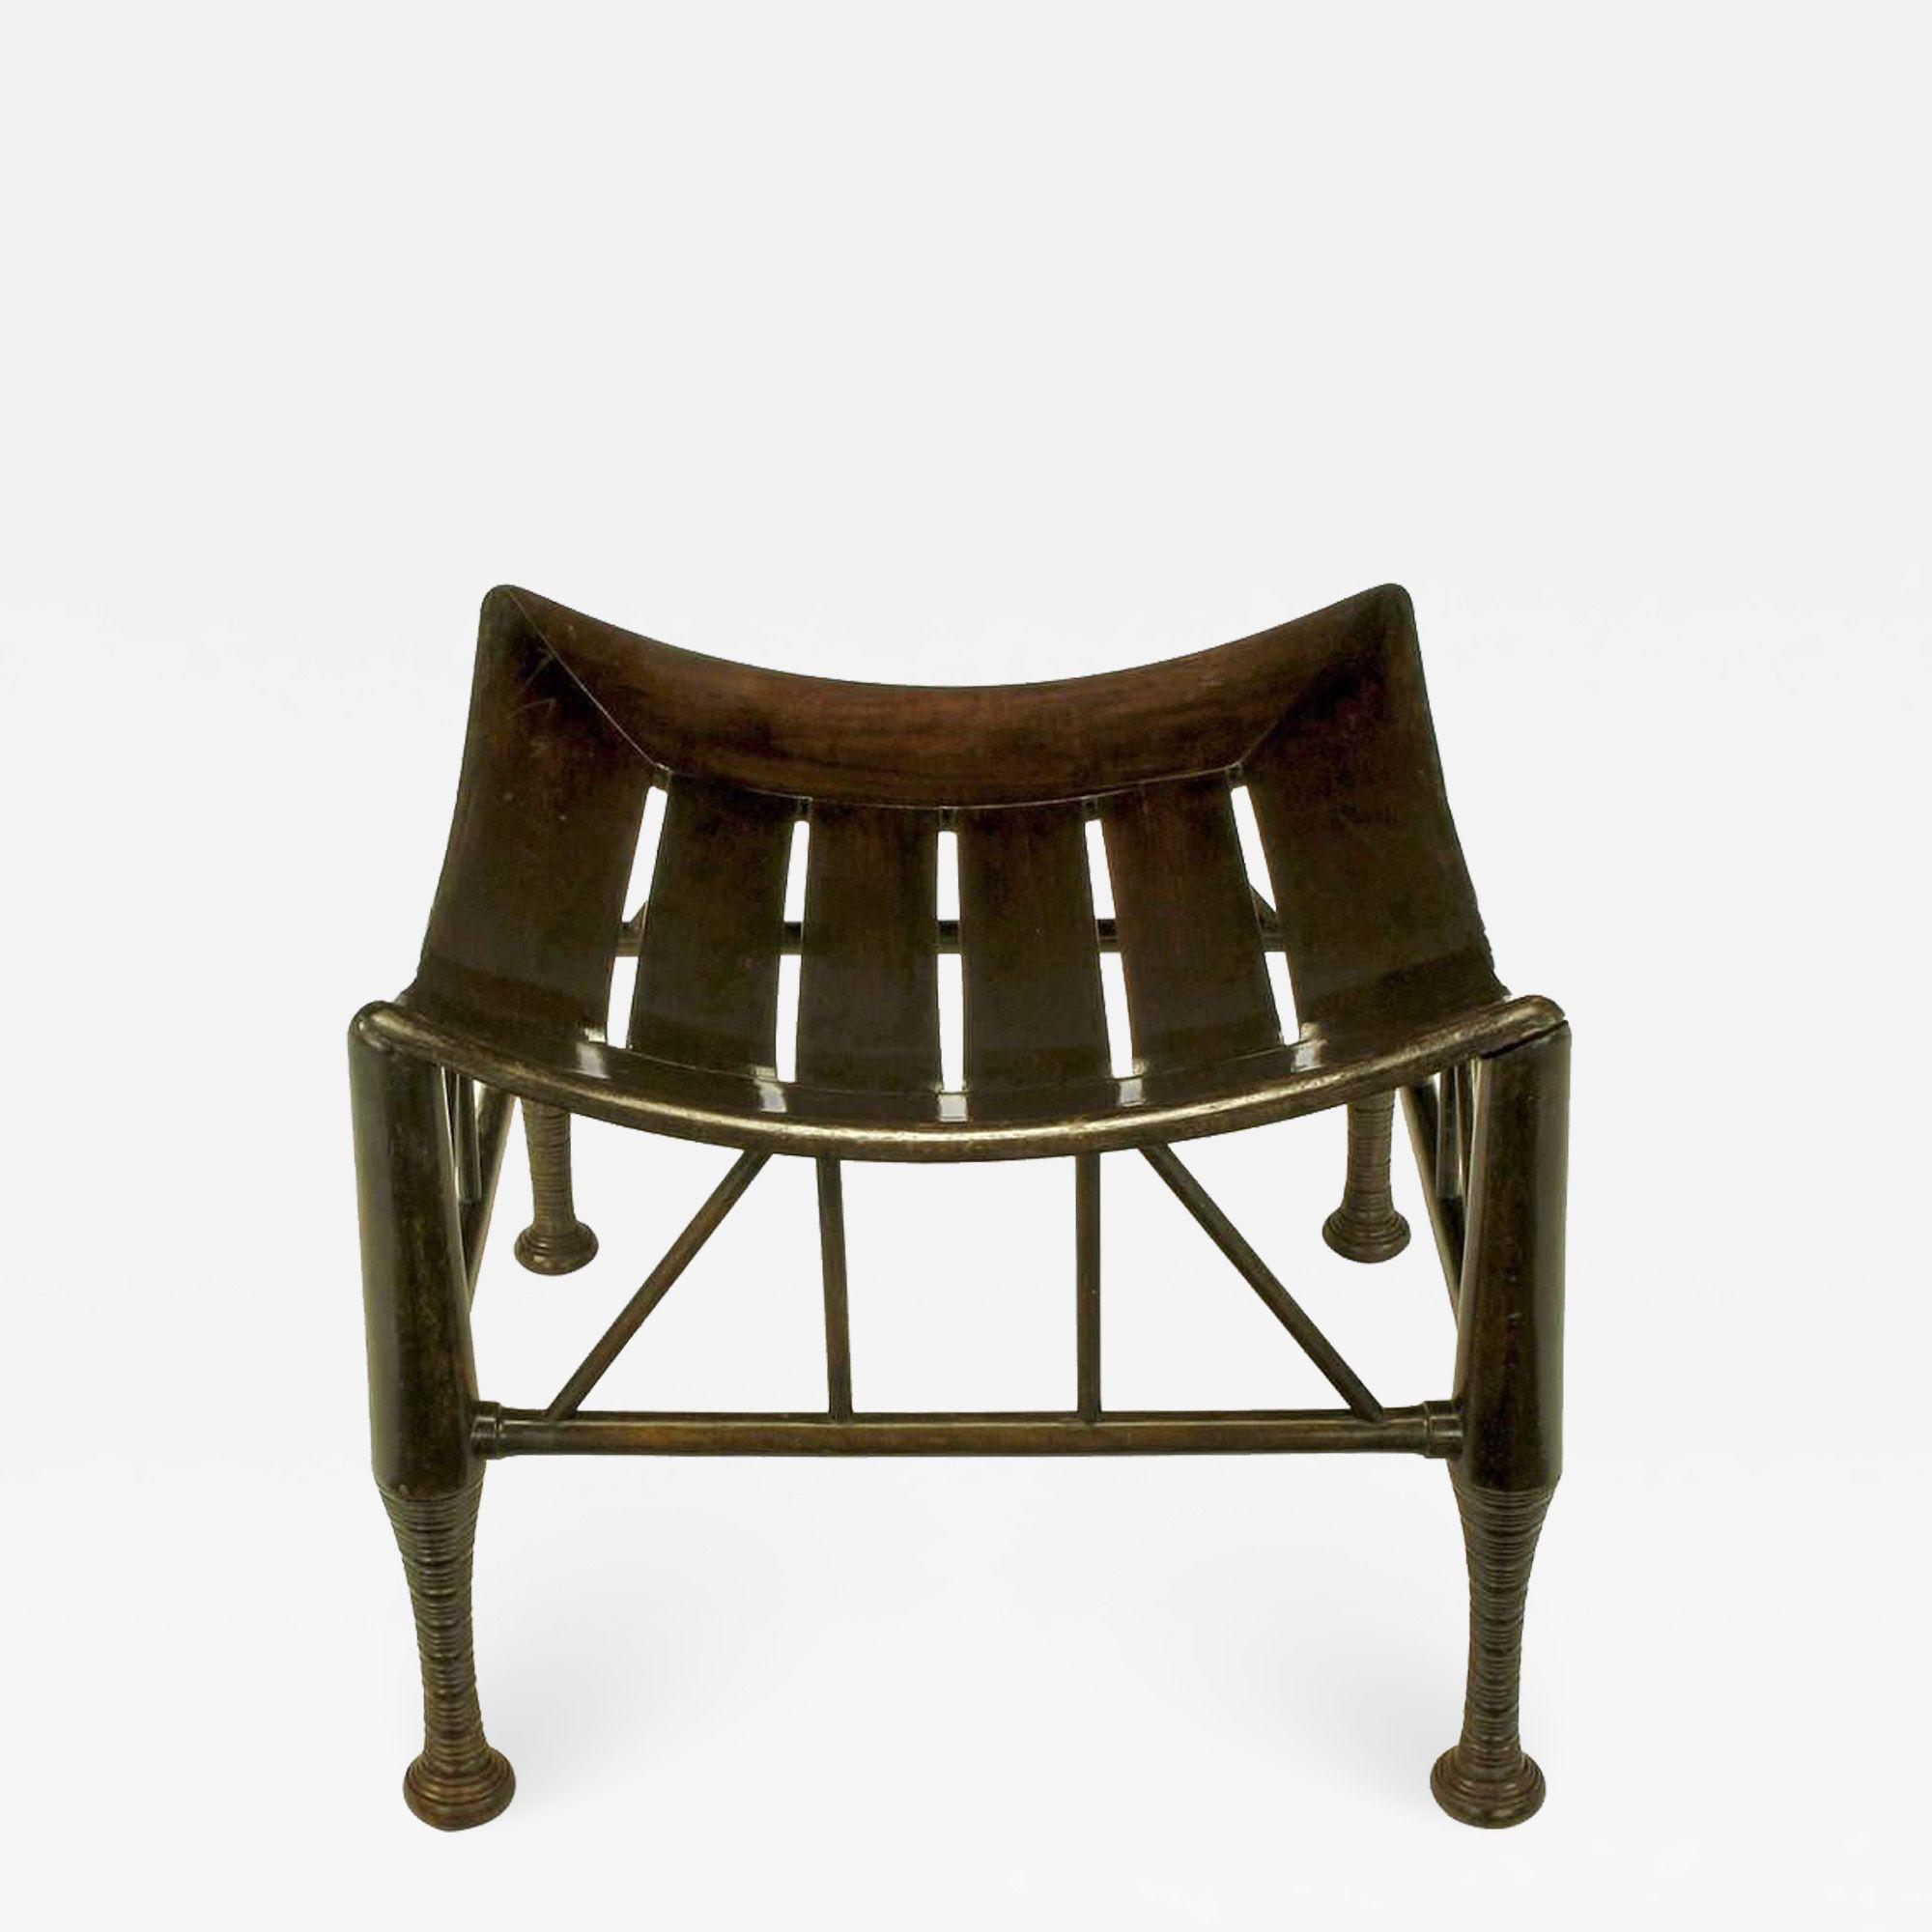 Pleasing Dark Oak Egyptian Revival Thebes Stool Circa 1900 Liberty Dailytribune Chair Design For Home Dailytribuneorg